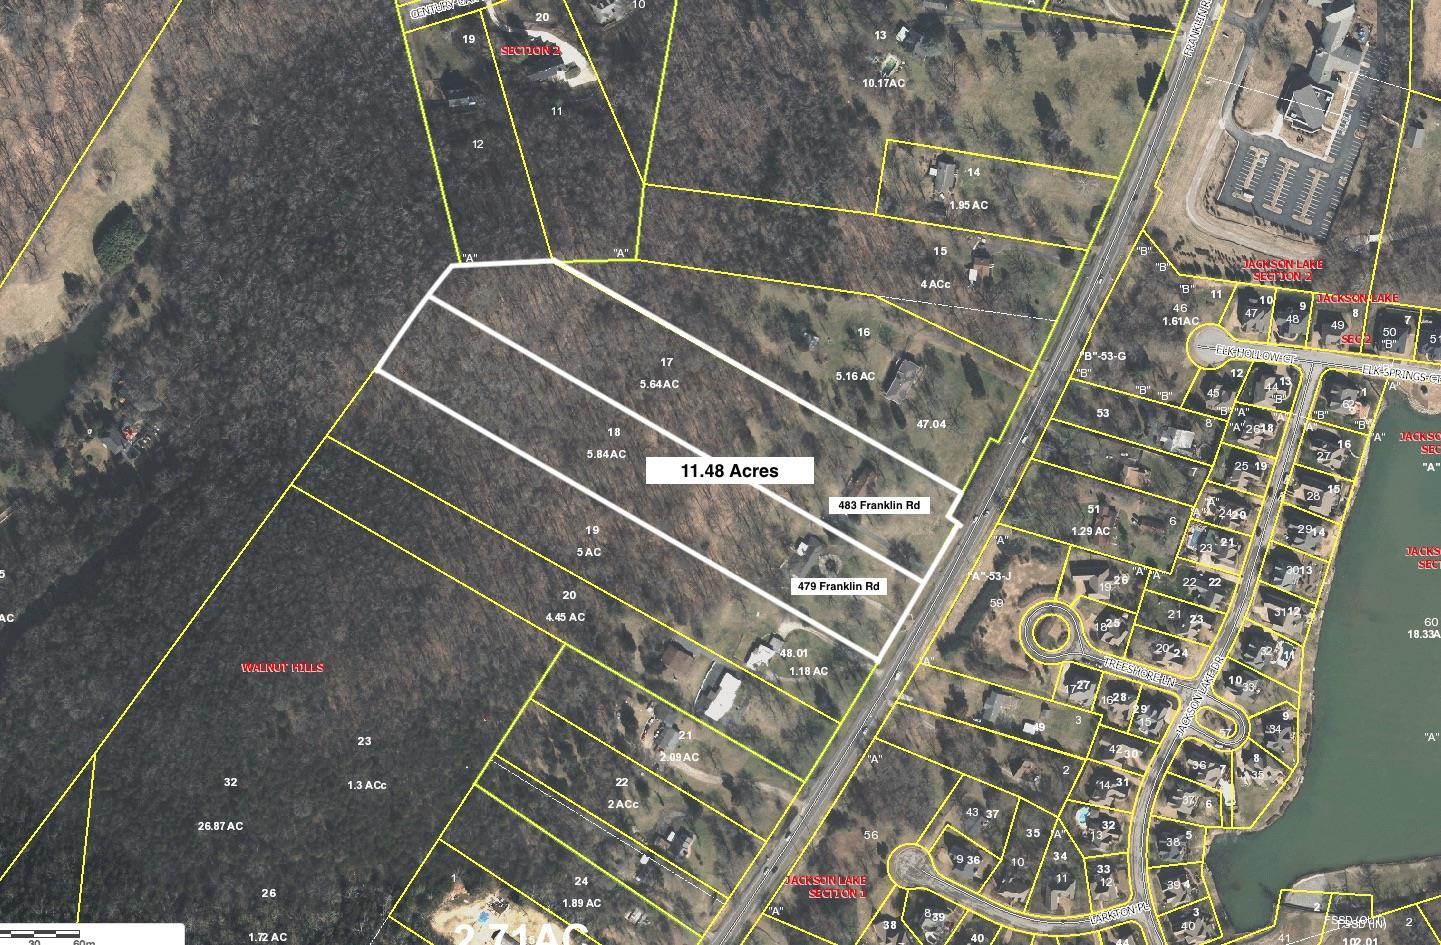 483 Franklin Rd, Franklin, TN 37069 - Franklin, TN real estate listing